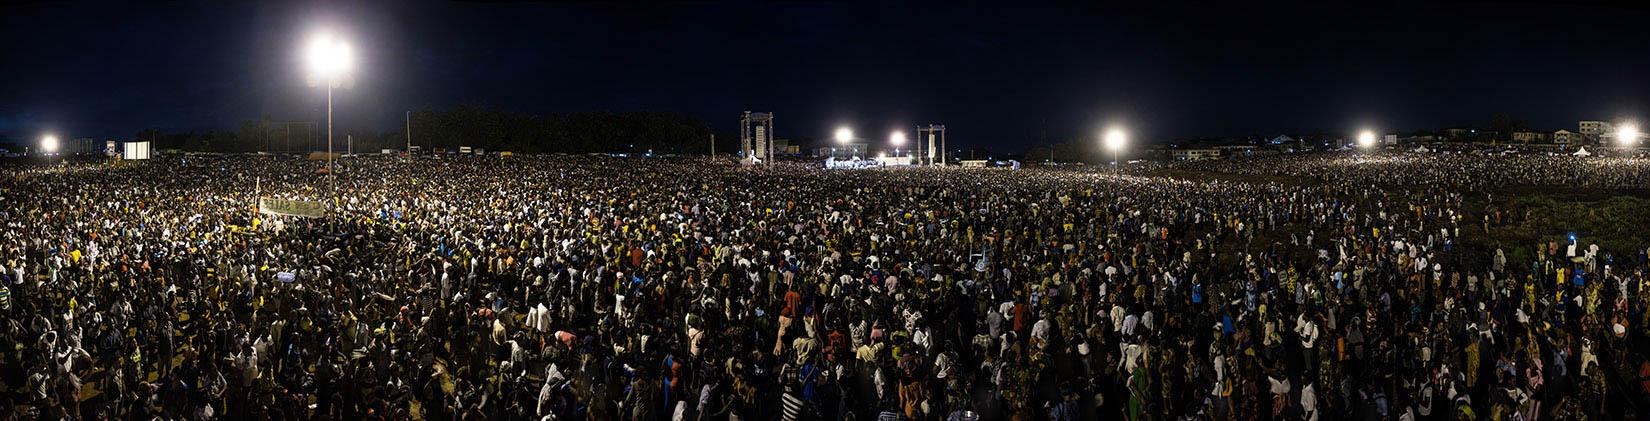 Ghana_Kumasi_D3_2014-BIG